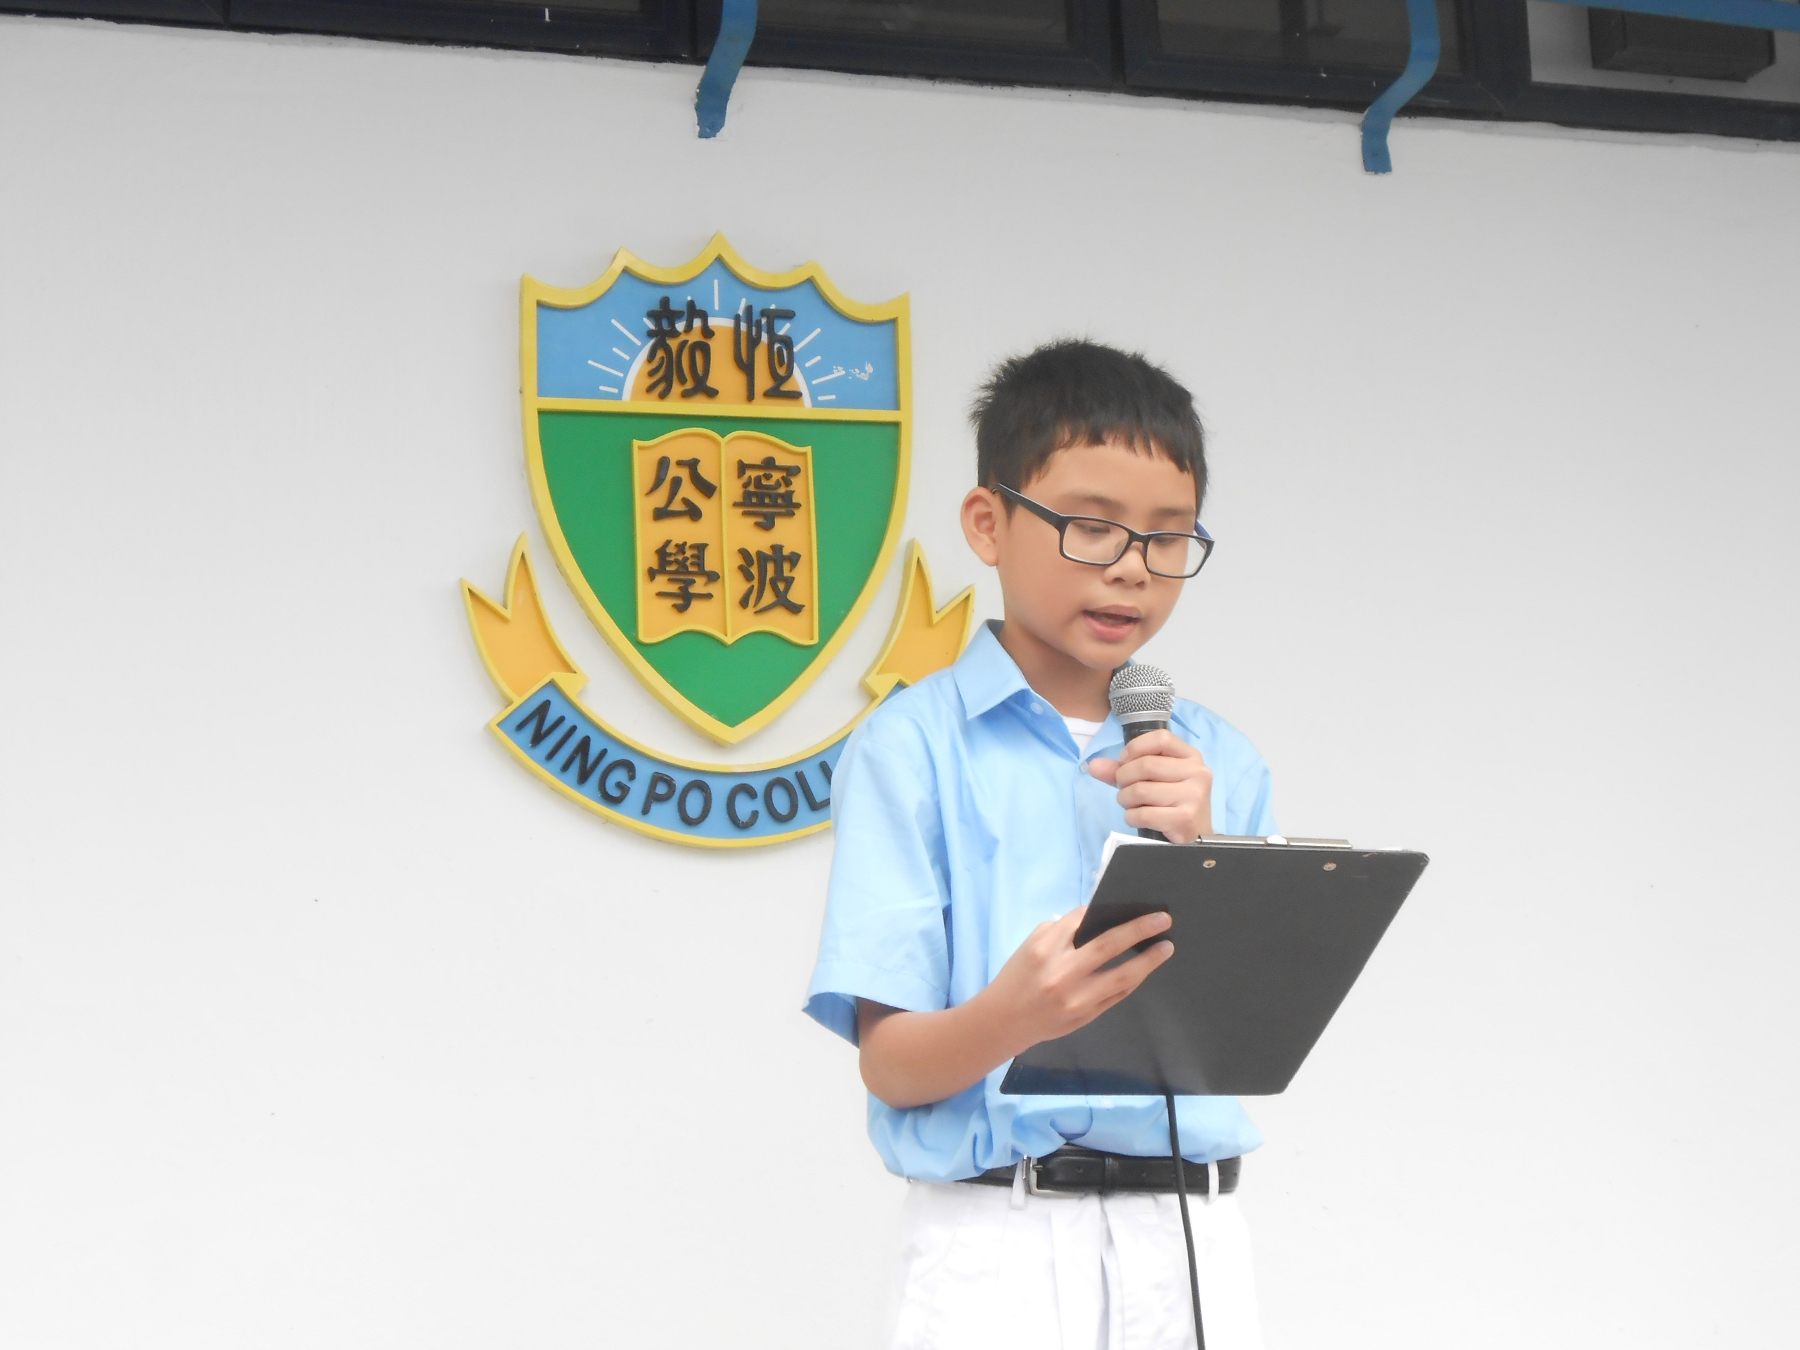 http://npc.edu.hk/sites/default/files/dscn0284.jpg